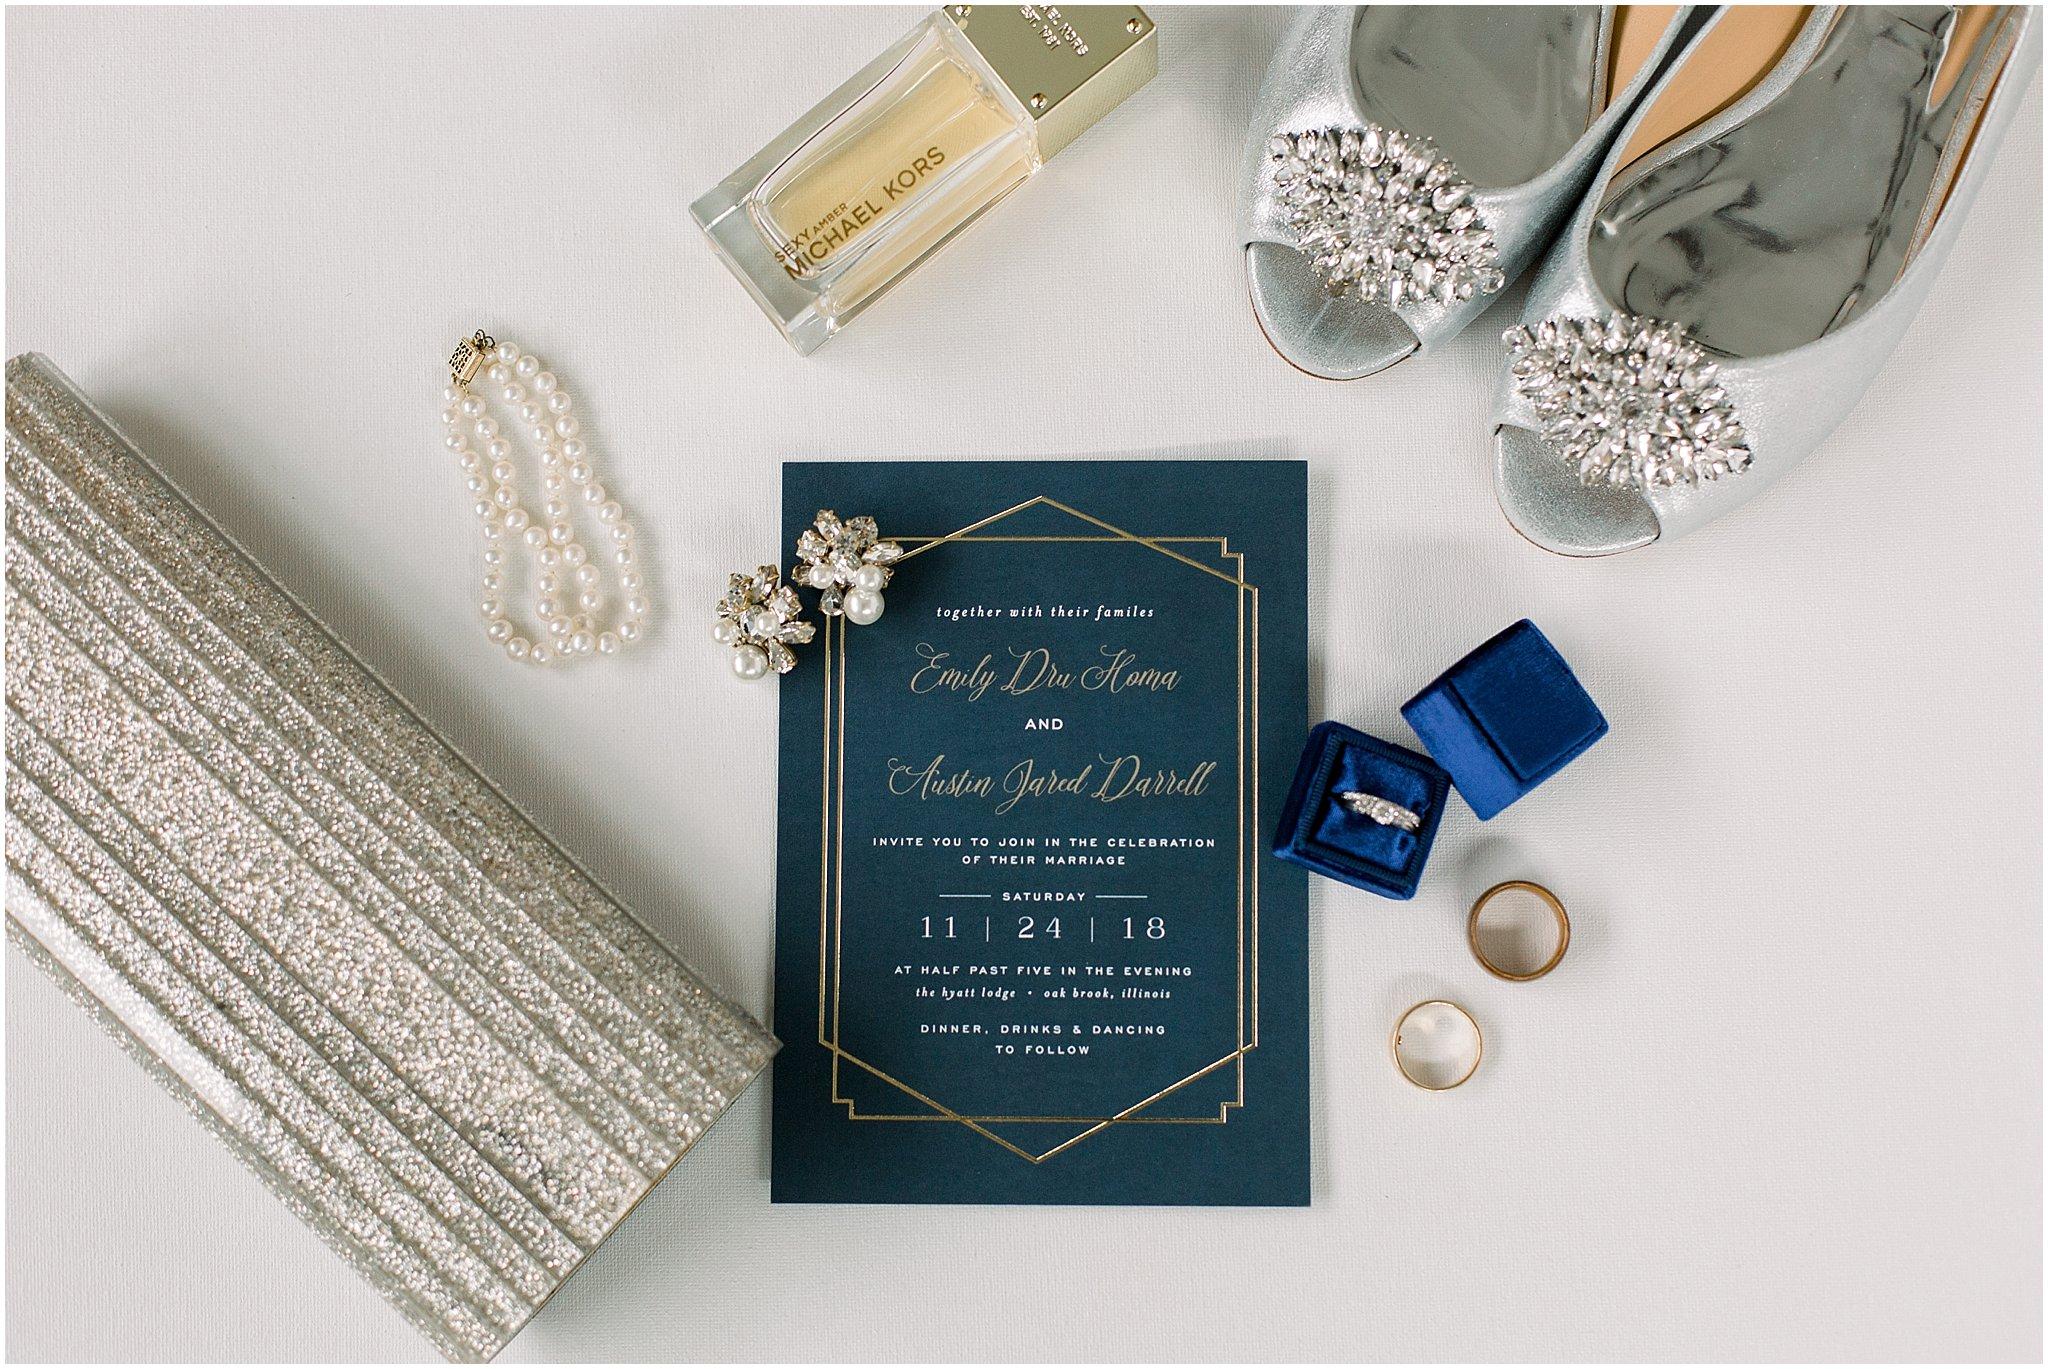 Hyatt-Lodge-Mcdonald-Campus-Wedding_0003.jpg